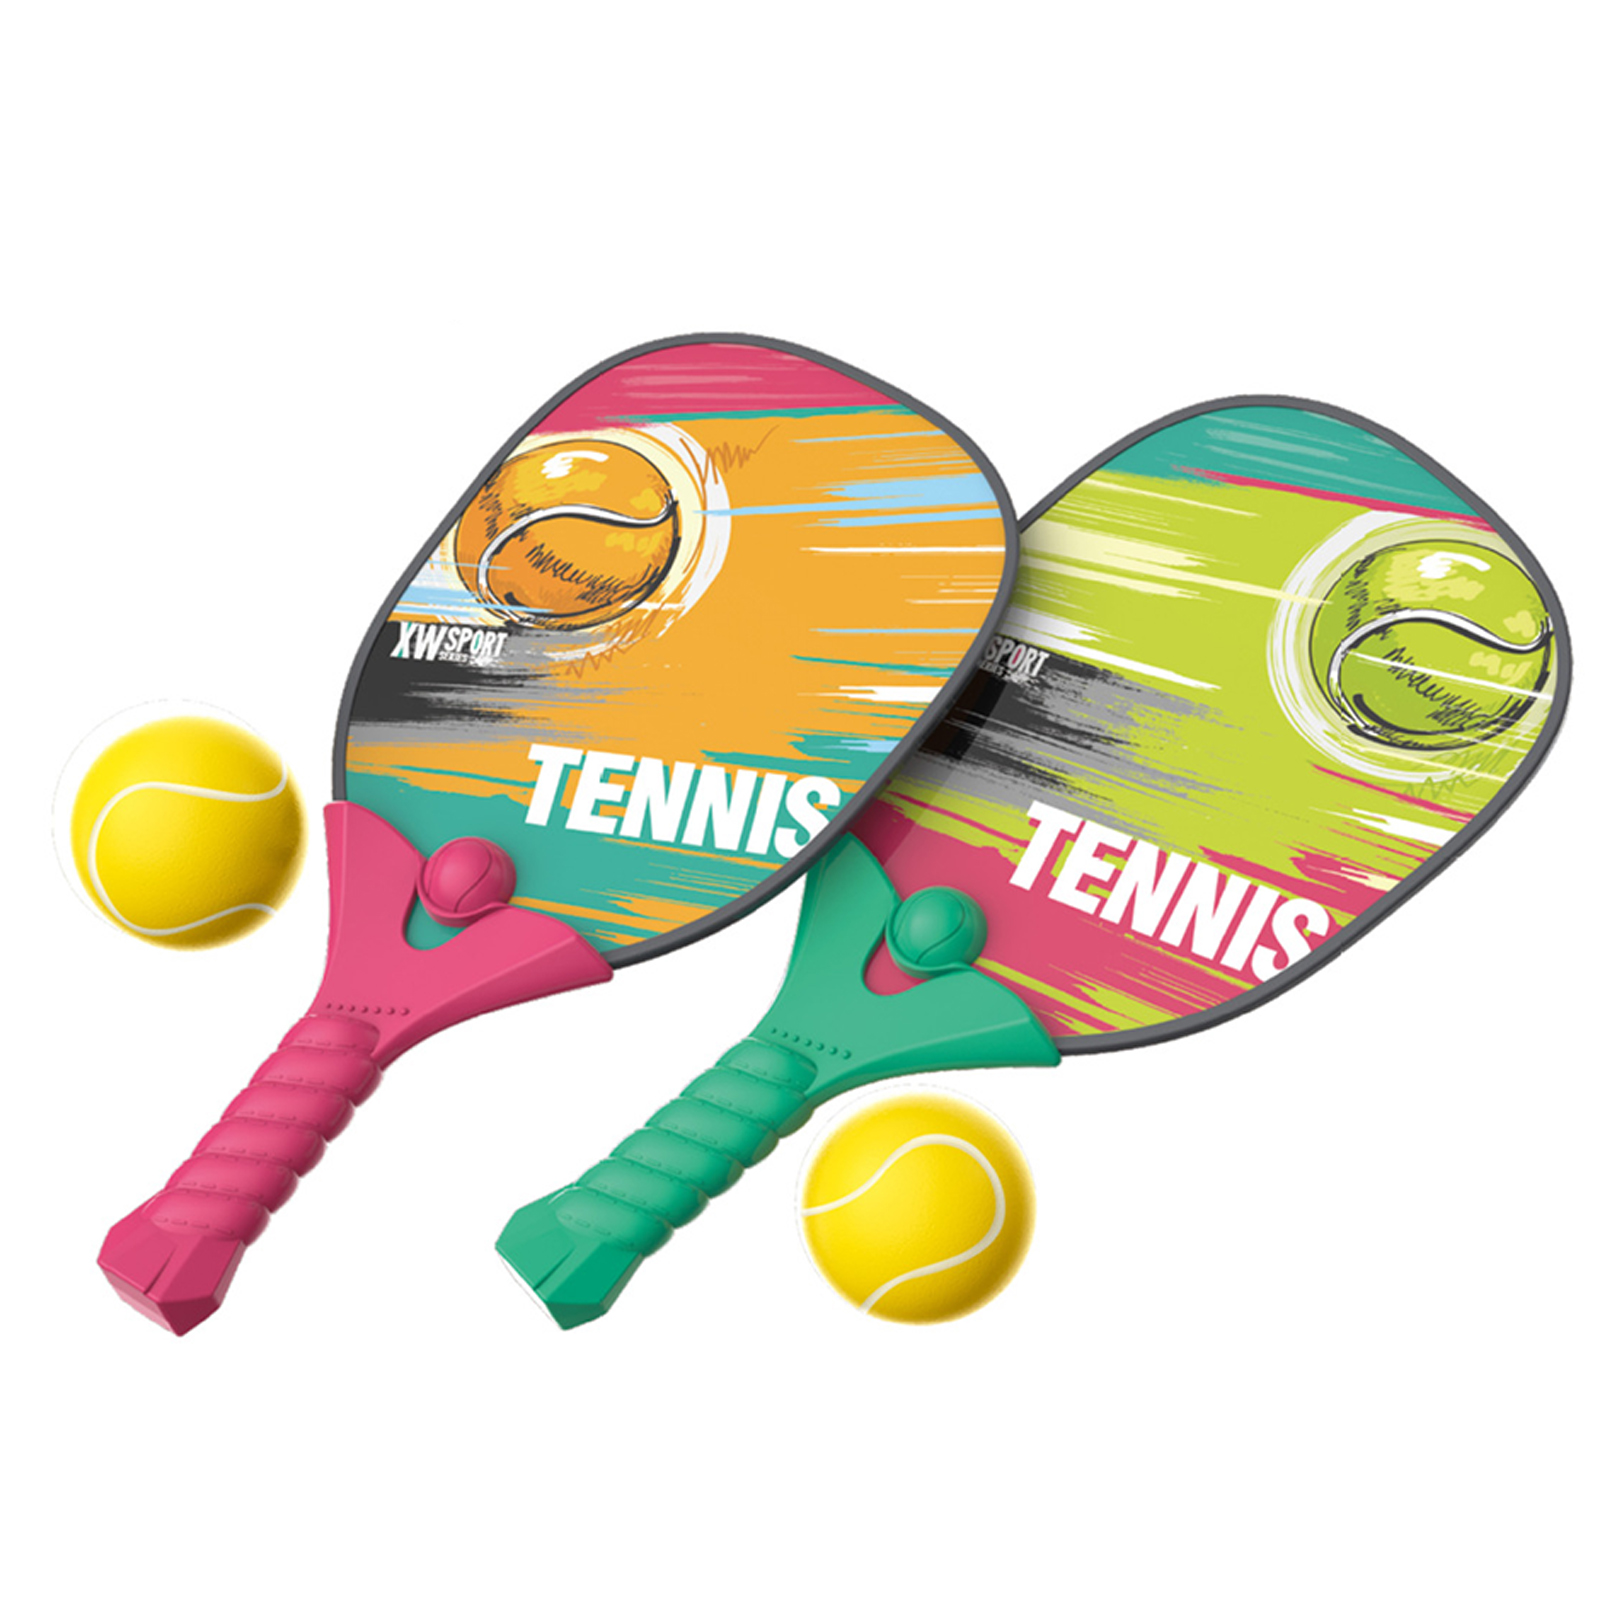 Kids Children'sTennis Pick Racket With Balls Safe Durable Squash Racket Outdoor Beach Play Sports Equipment Toys